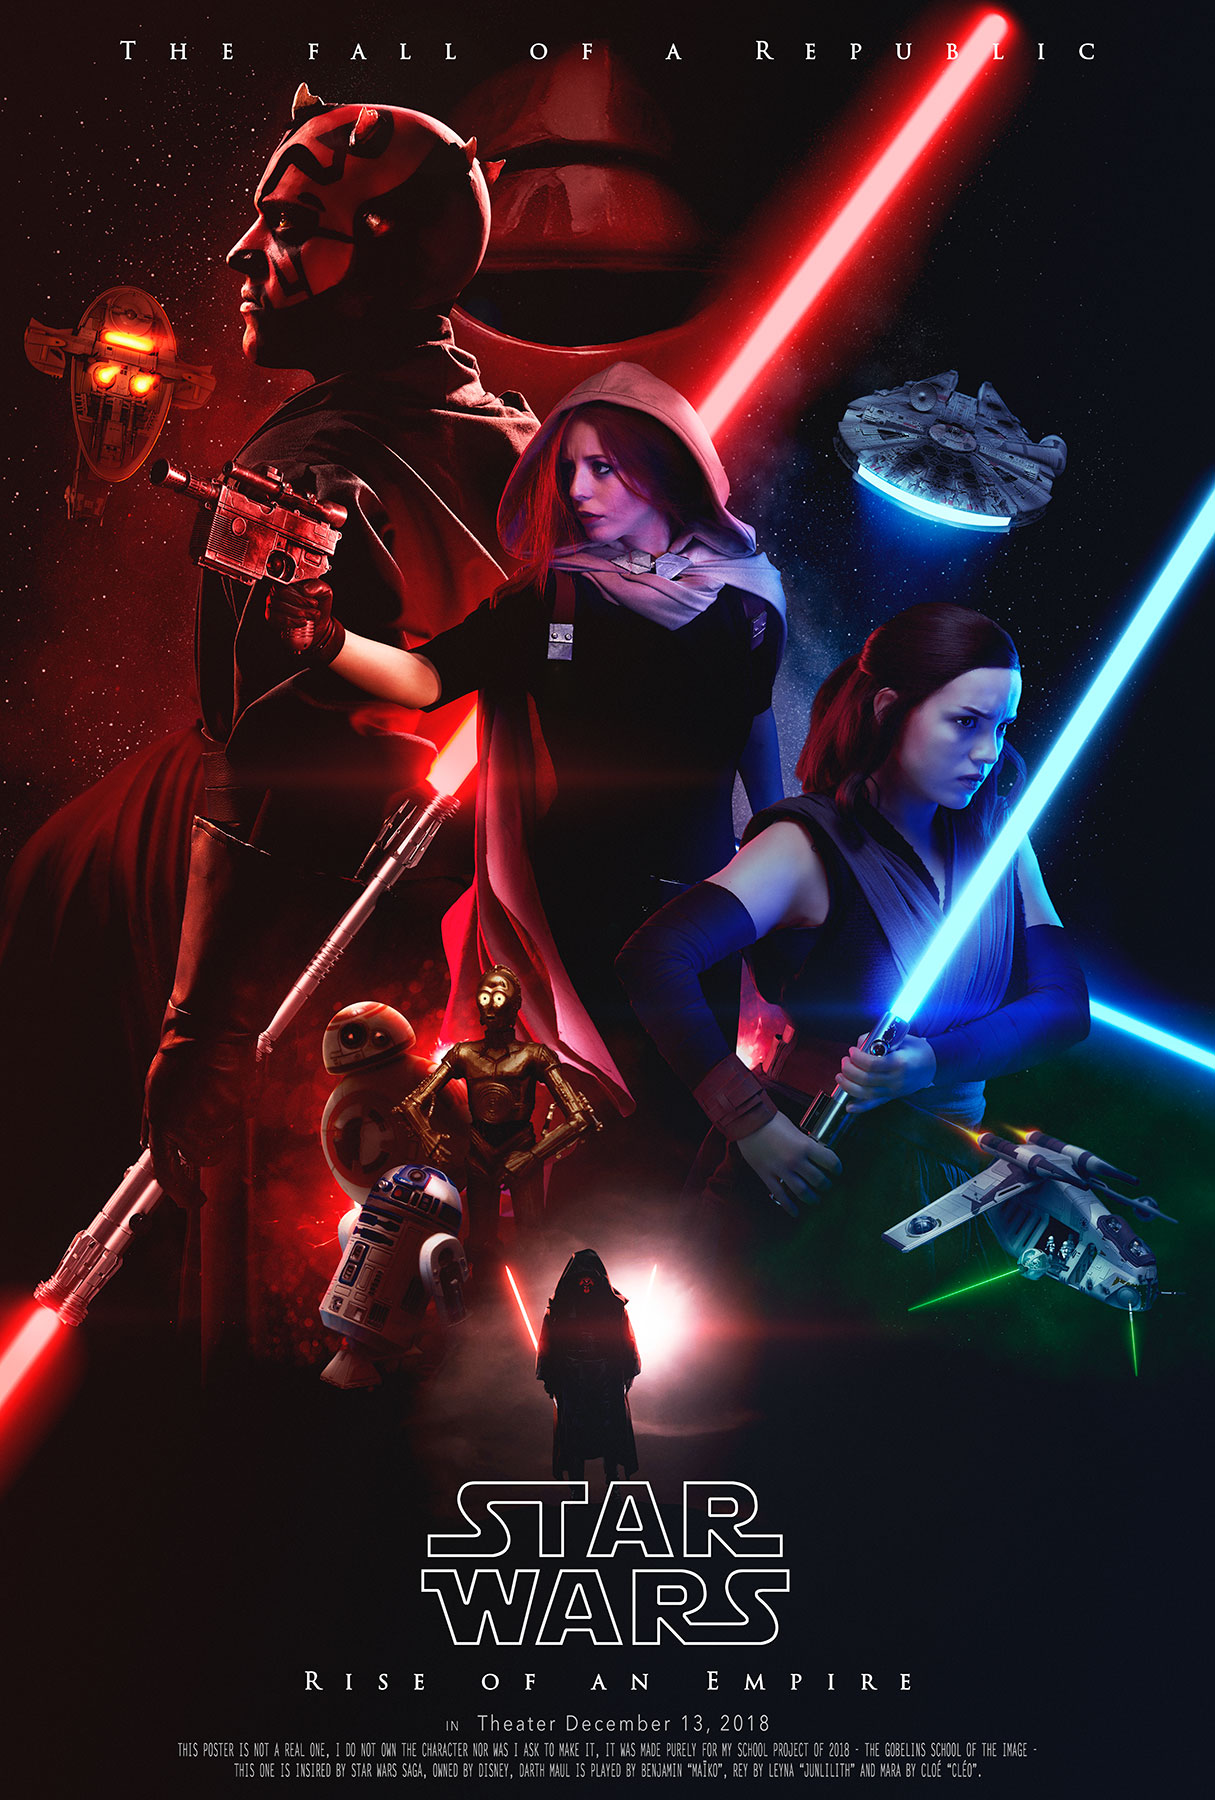 Sayanoff Arthur Star Wars Poster 02 16